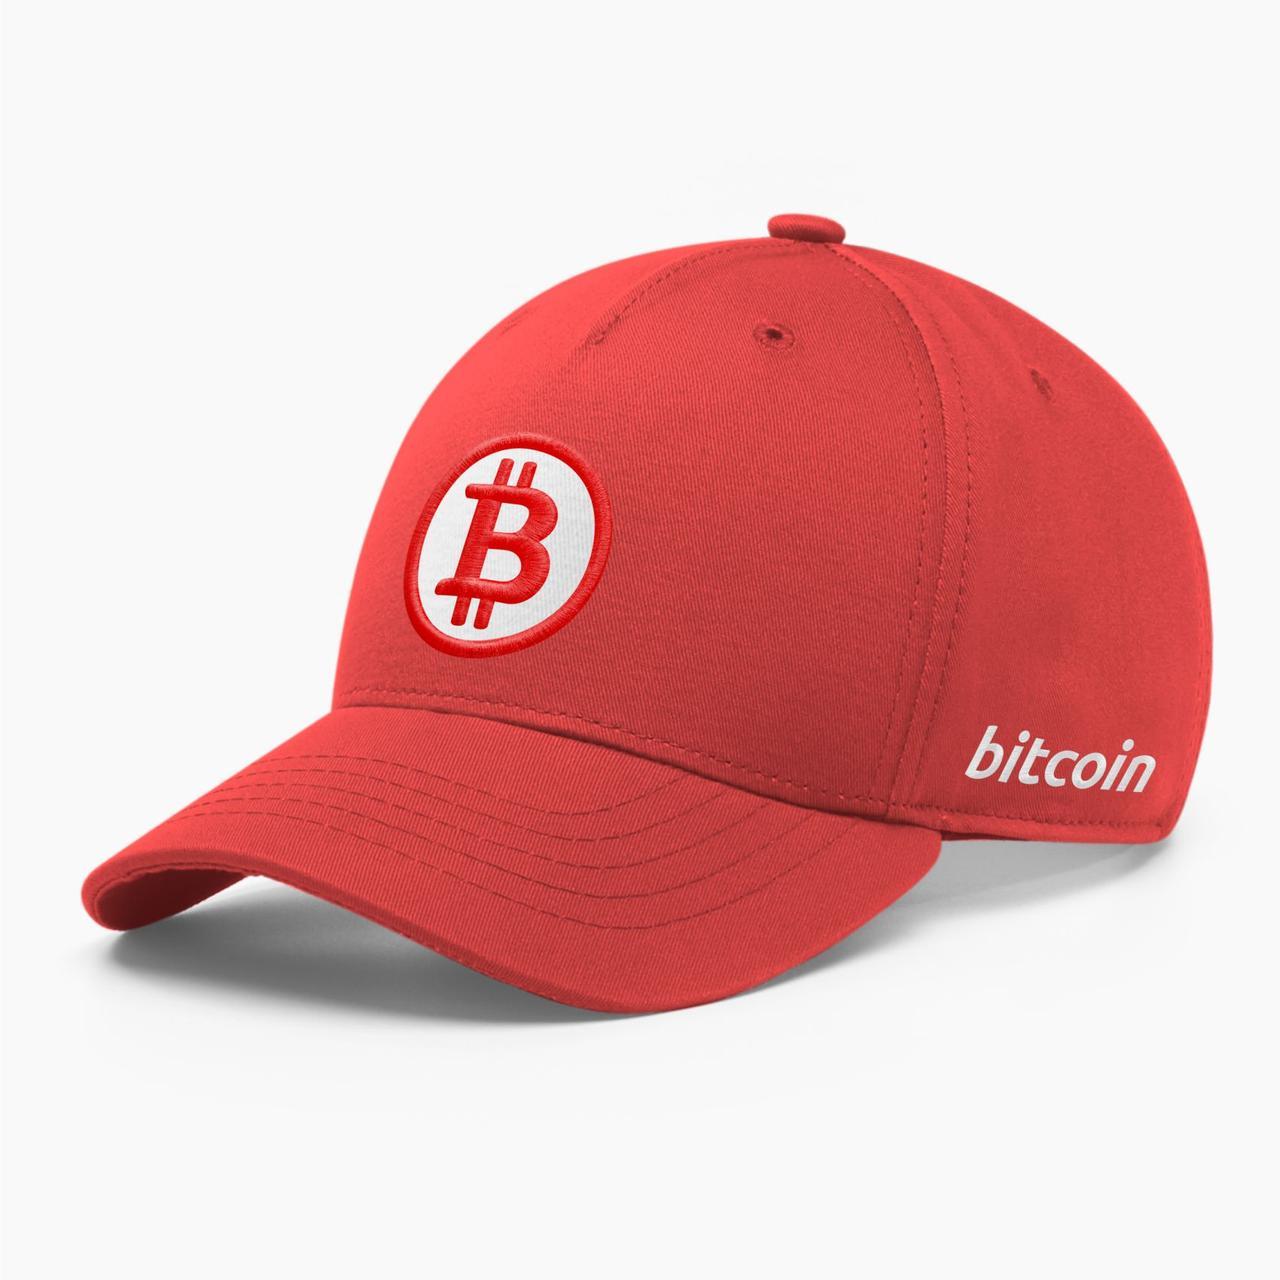 Кепка бейсболка INAL Биткоин Bitcoin BTC S / 53-54 RU Красный 7353